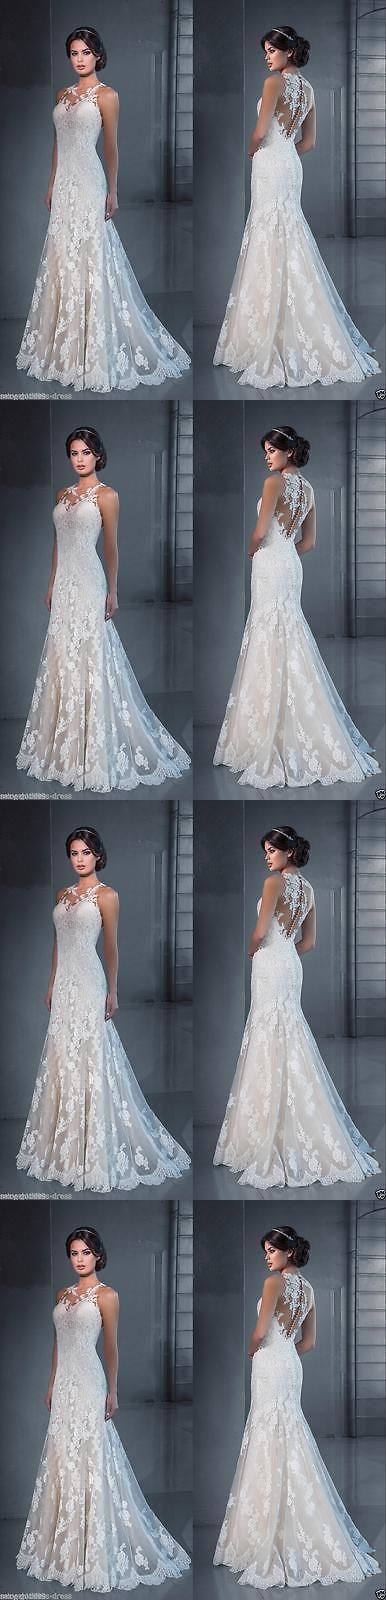 Wedding Dresses: 2016 White Ivory Wedding Dress Bridal Gown Stock Custom Size 4 6 8 10 12 14 16++ -> BUY IT NOW ONLY: $99 on eBay!